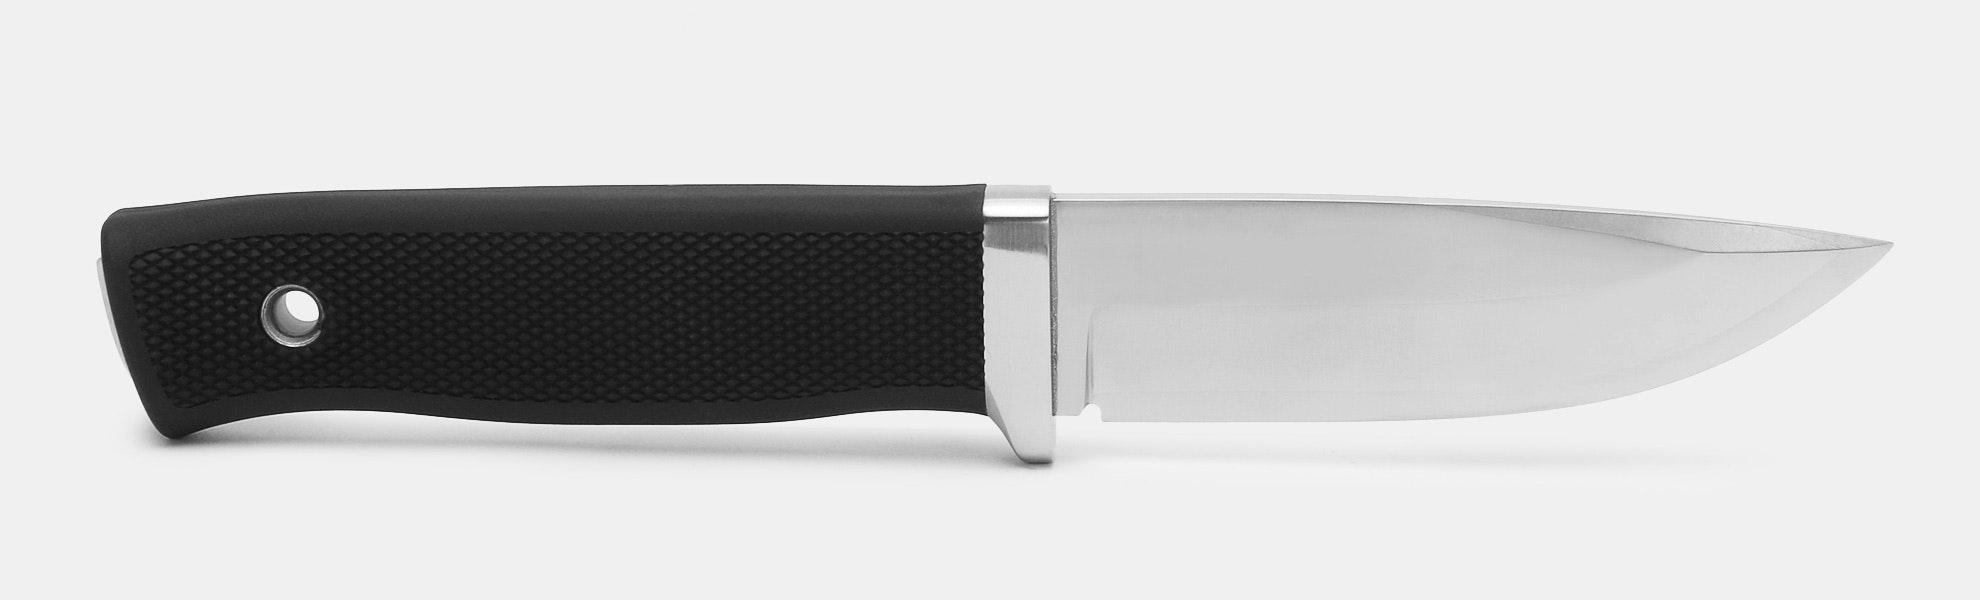 Fallkniven F1, A1 & S1 PRO Survival Knives